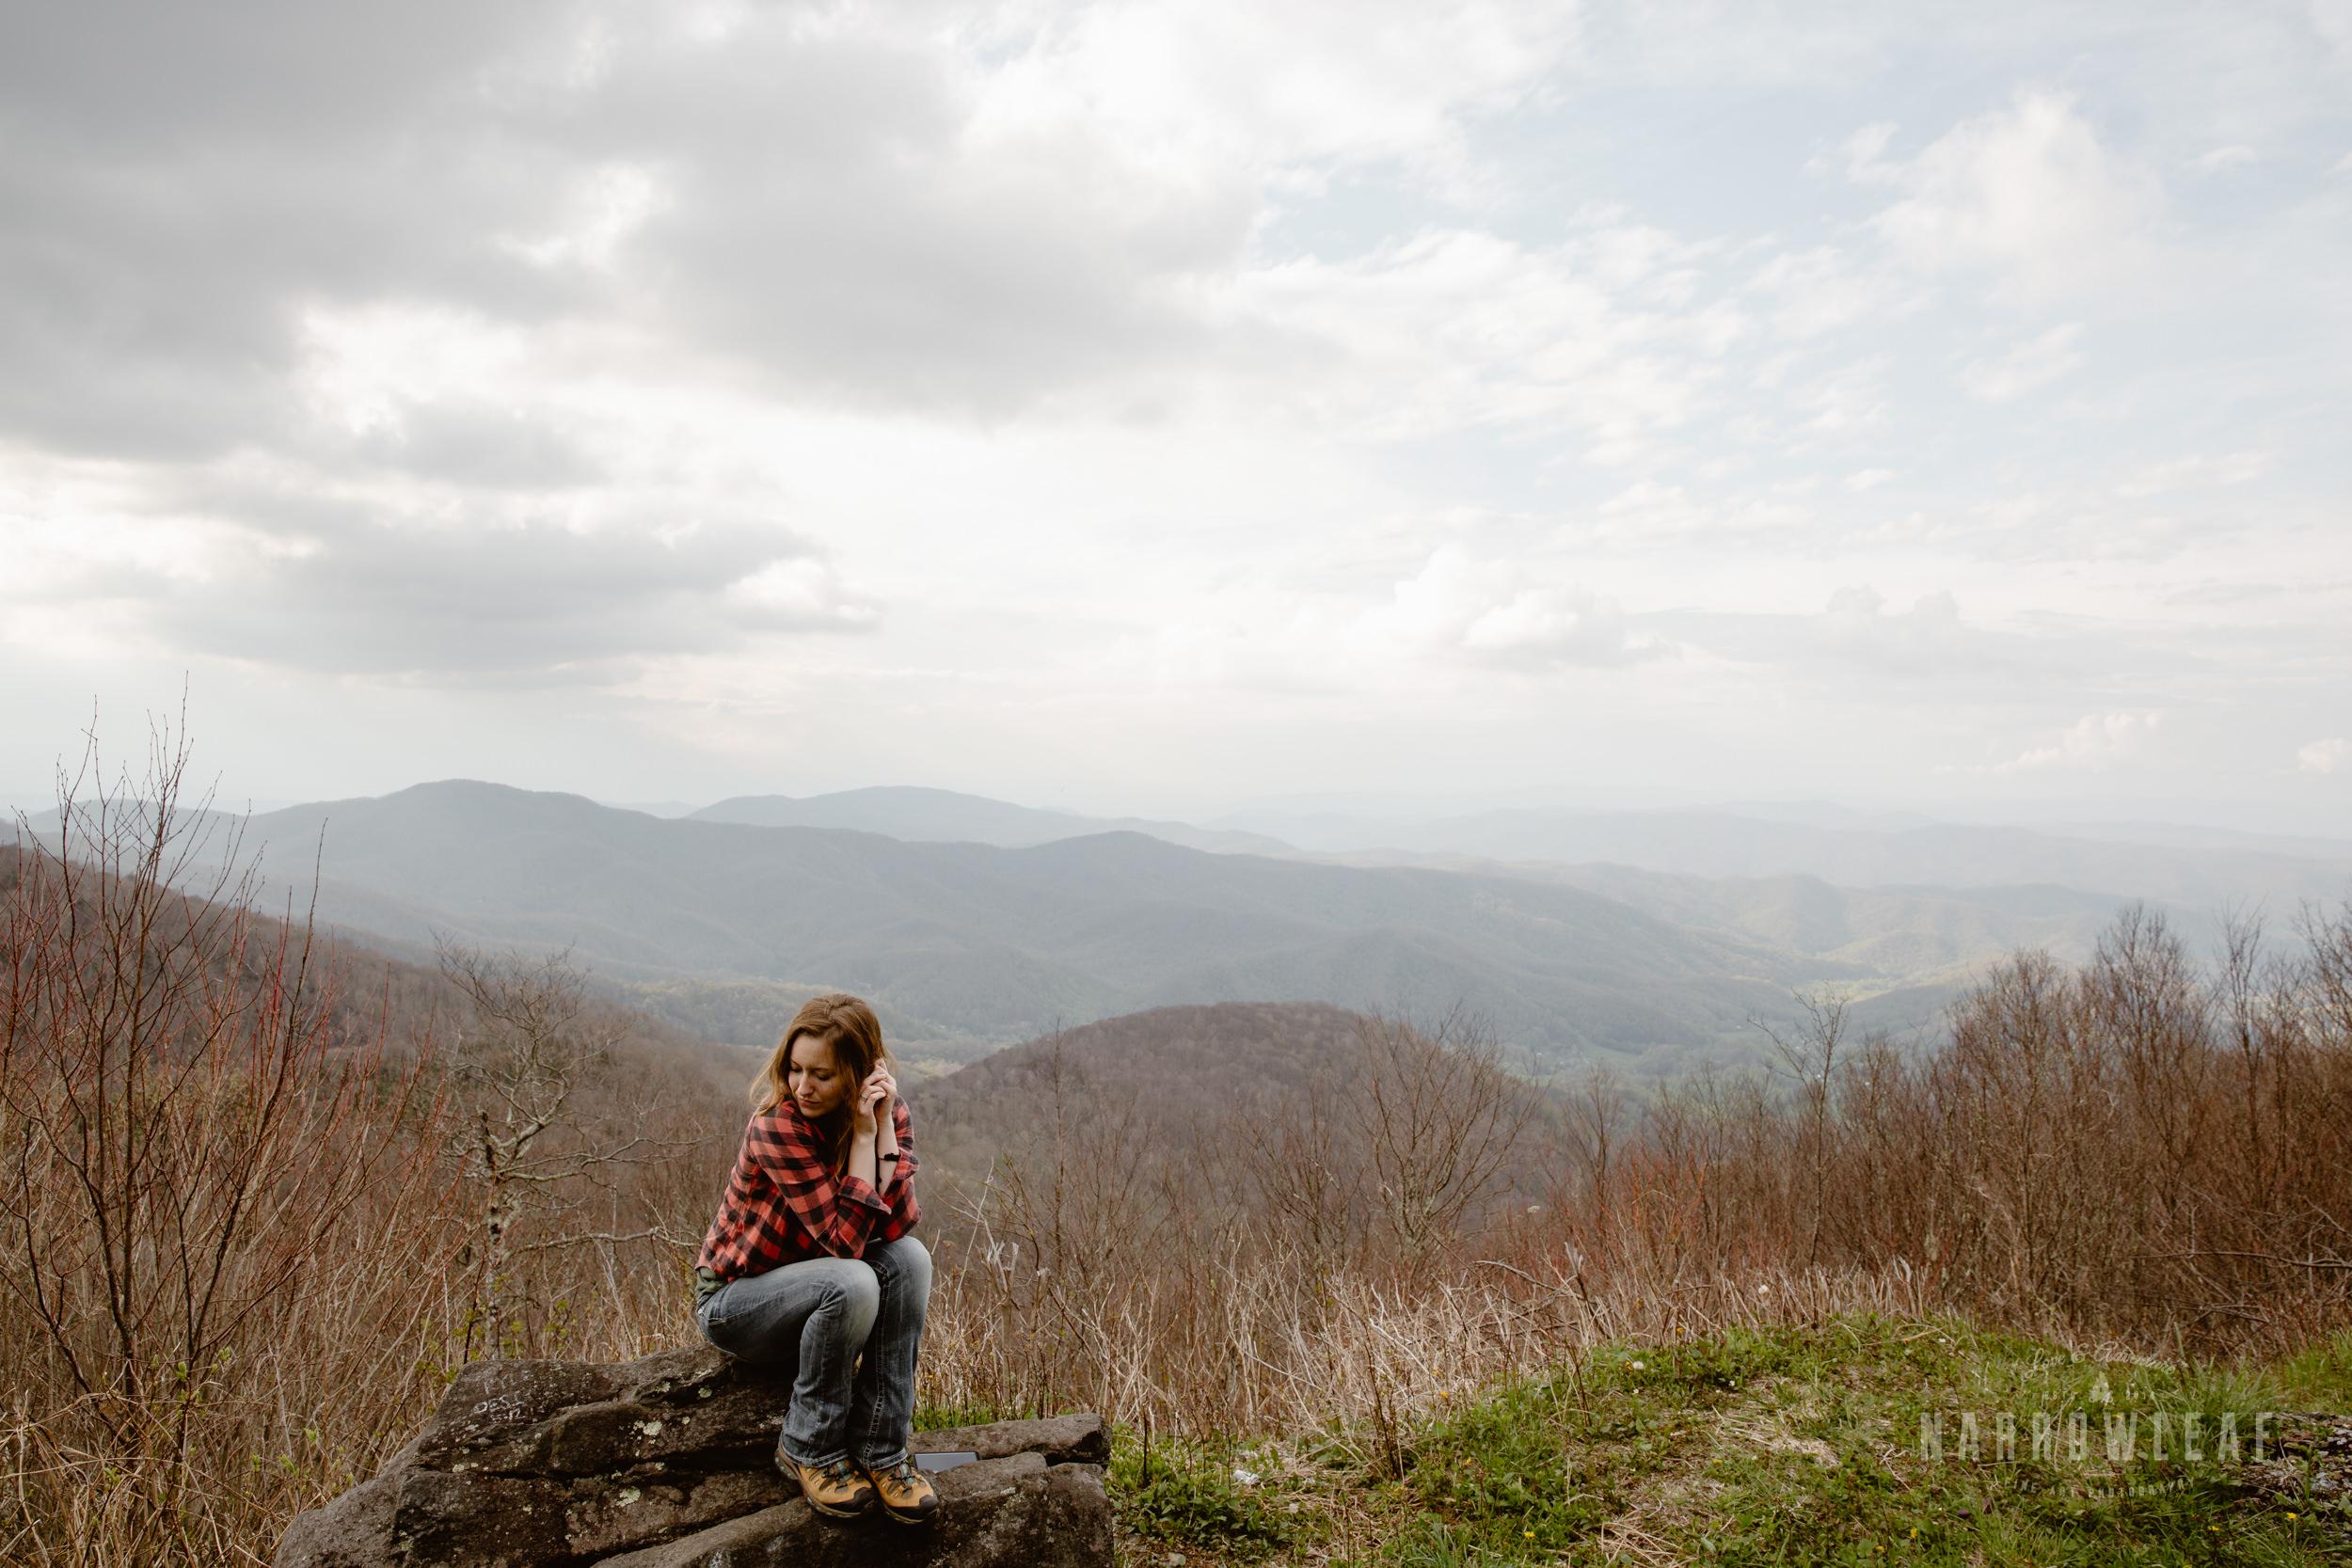 Hiking-Big-Bald-Mountain-Appalachian-Trail-in-Tennessee-Narrowleaf_Love_and_Adventure_Photography-3194.jpg